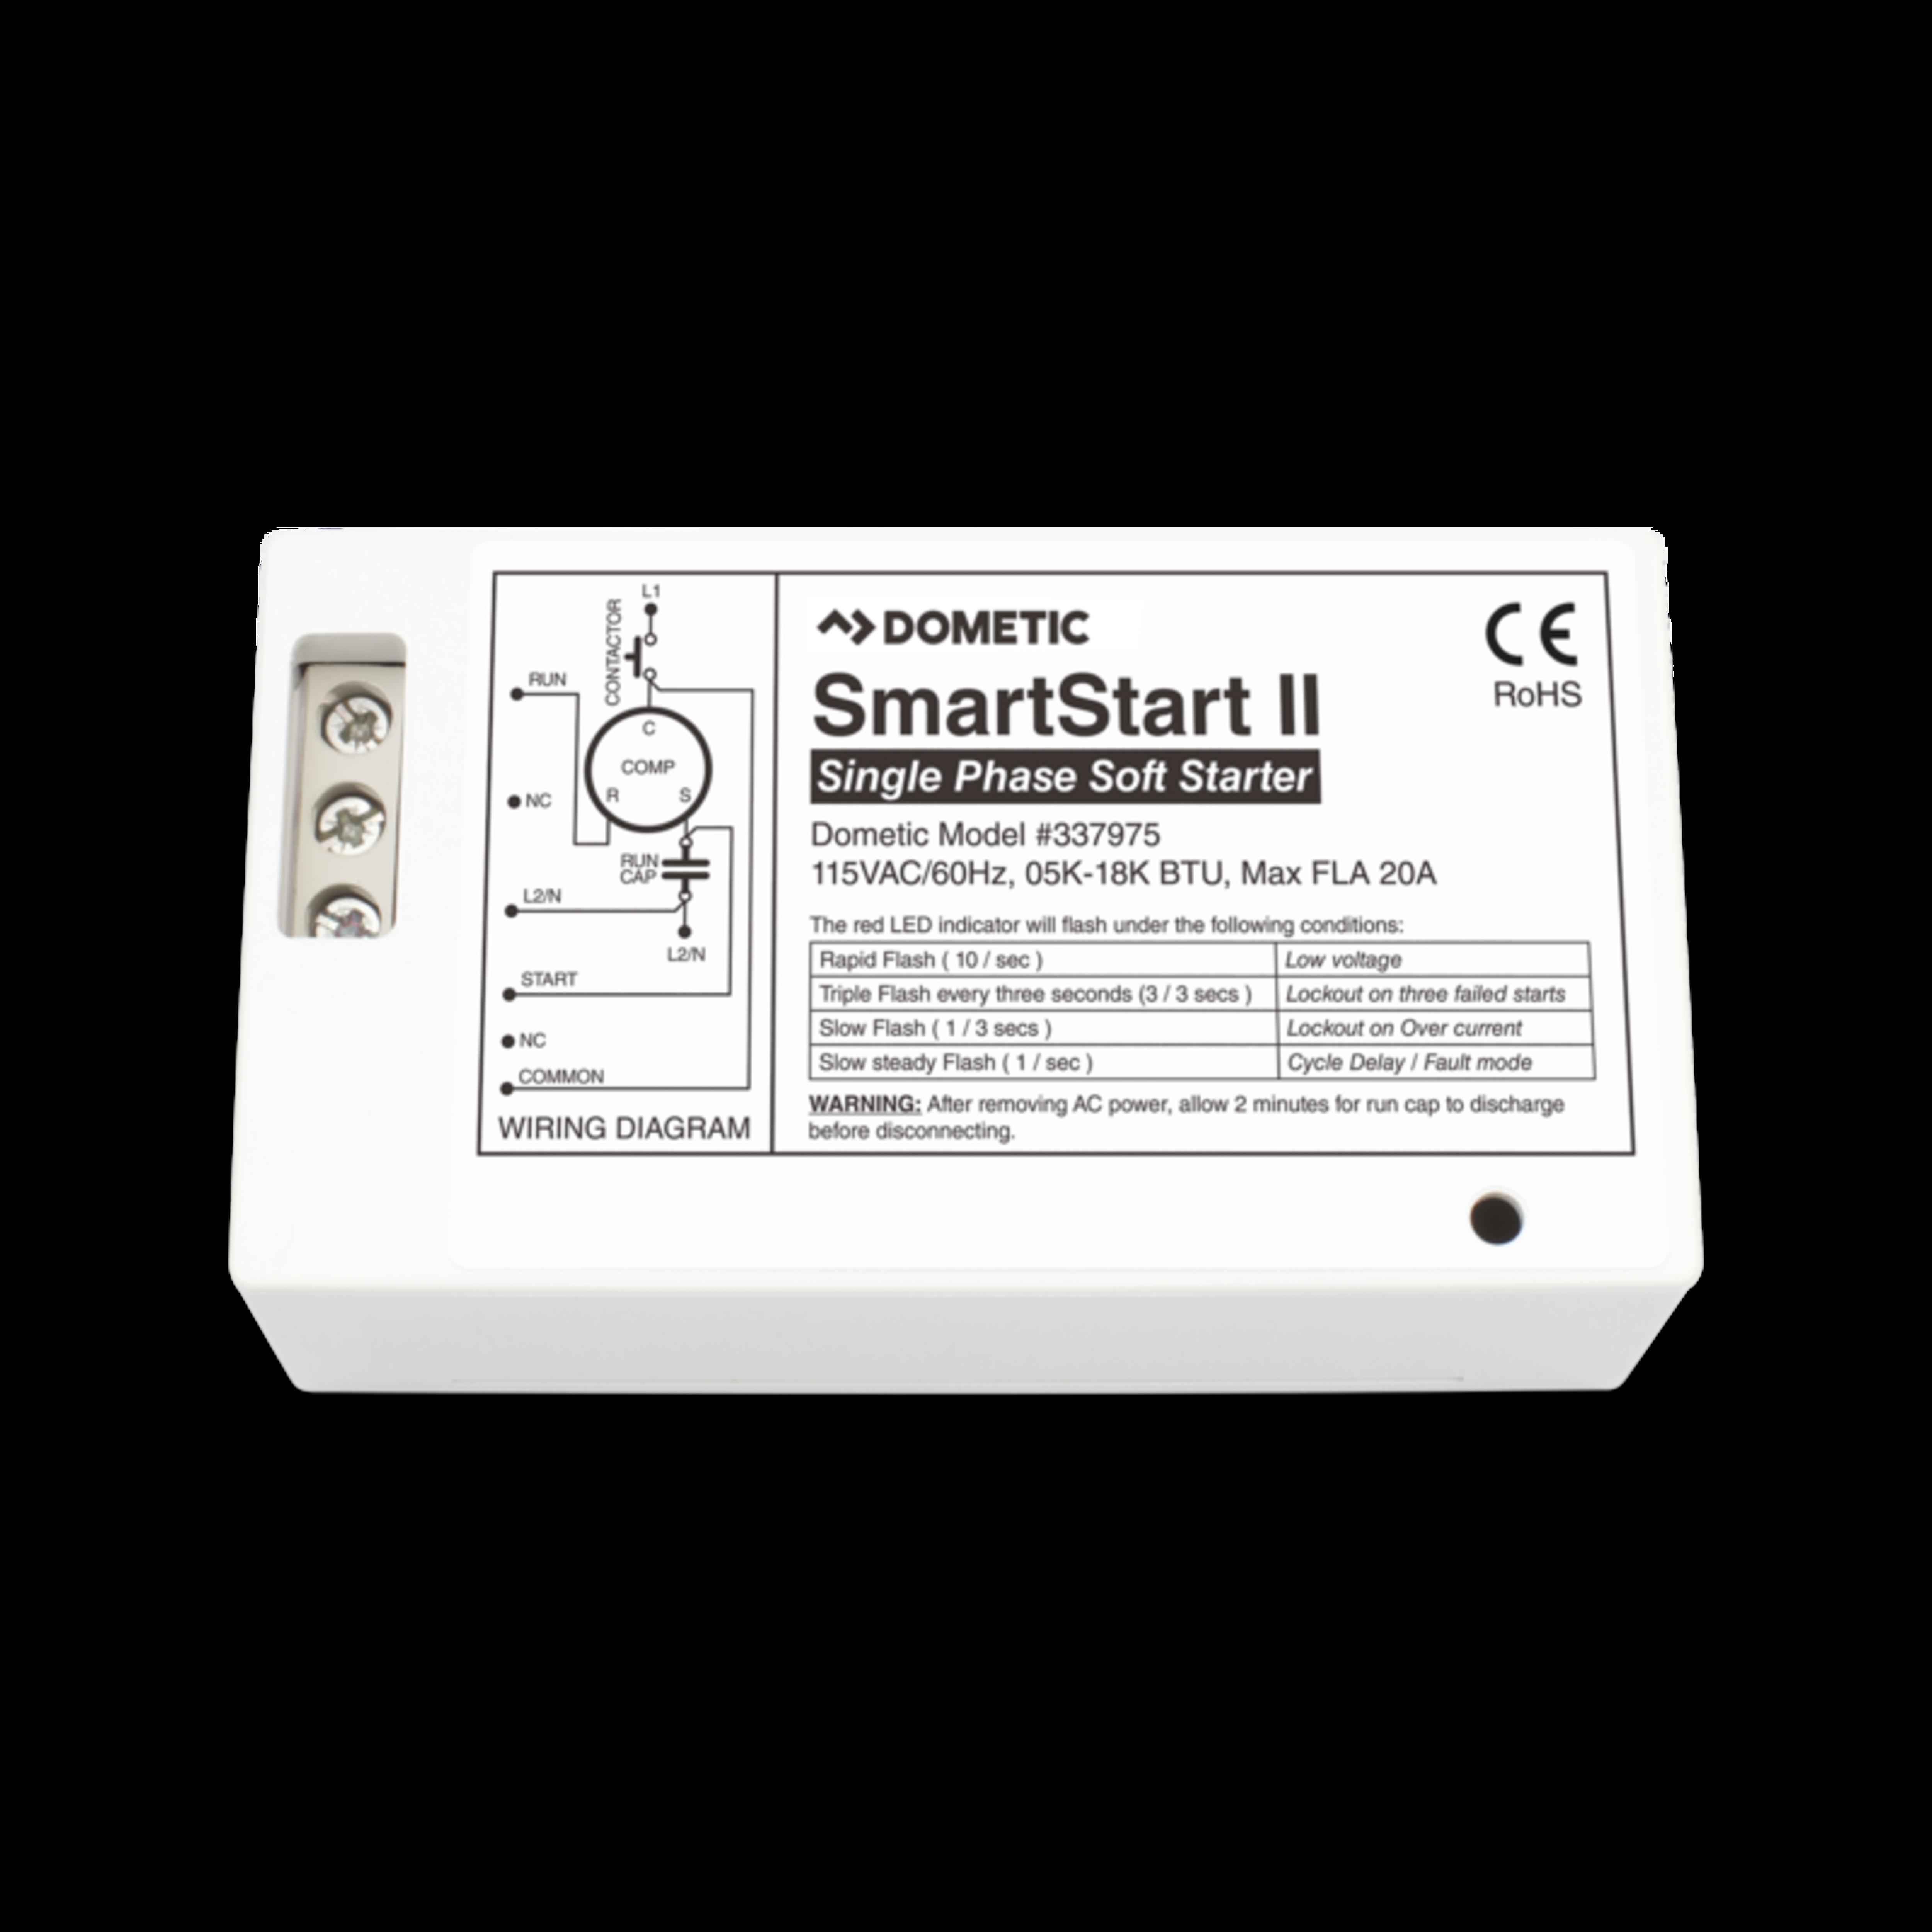 dometic_repl part_9600001291_44649_11?mw\\\=580\\\&mh\\\=580\\\&hash\\\=852FD965D34396EAC60F16E0C72A2AE7 smart start interlock wiring diagram detailed wiring diagram